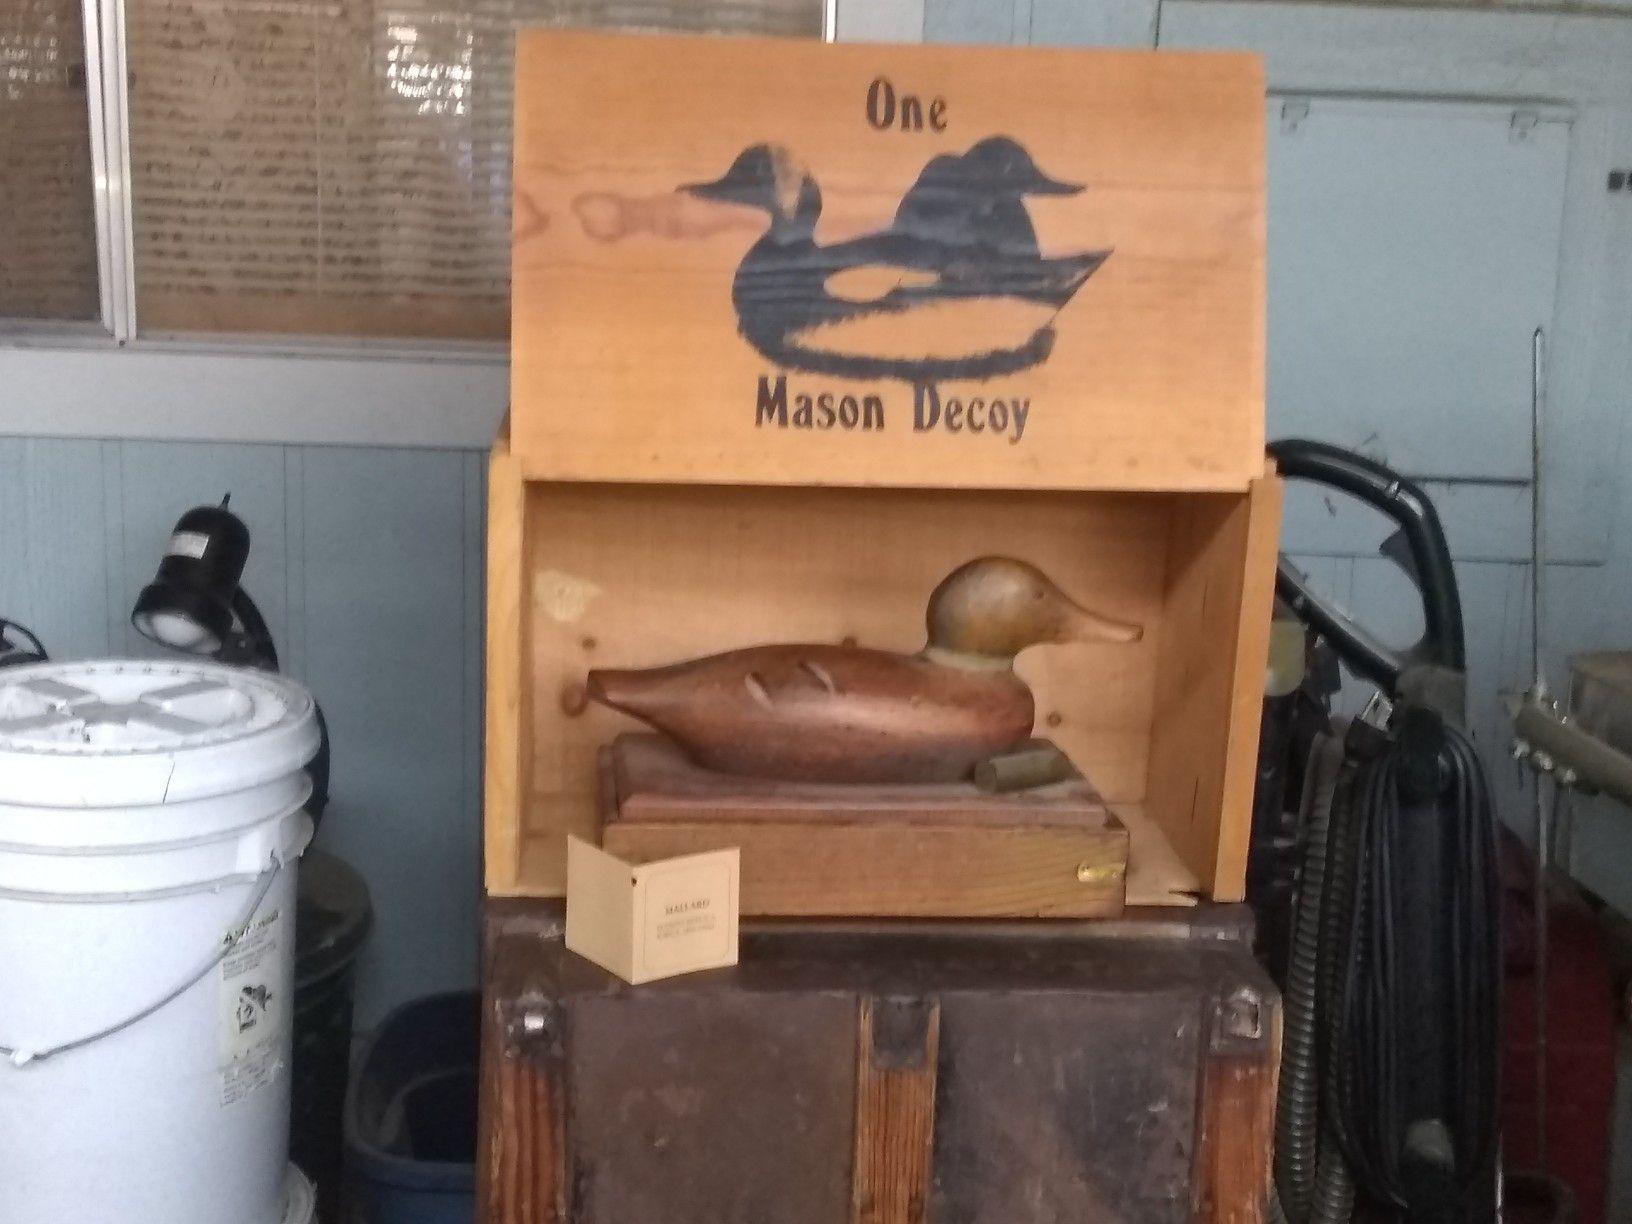 Mason decoy